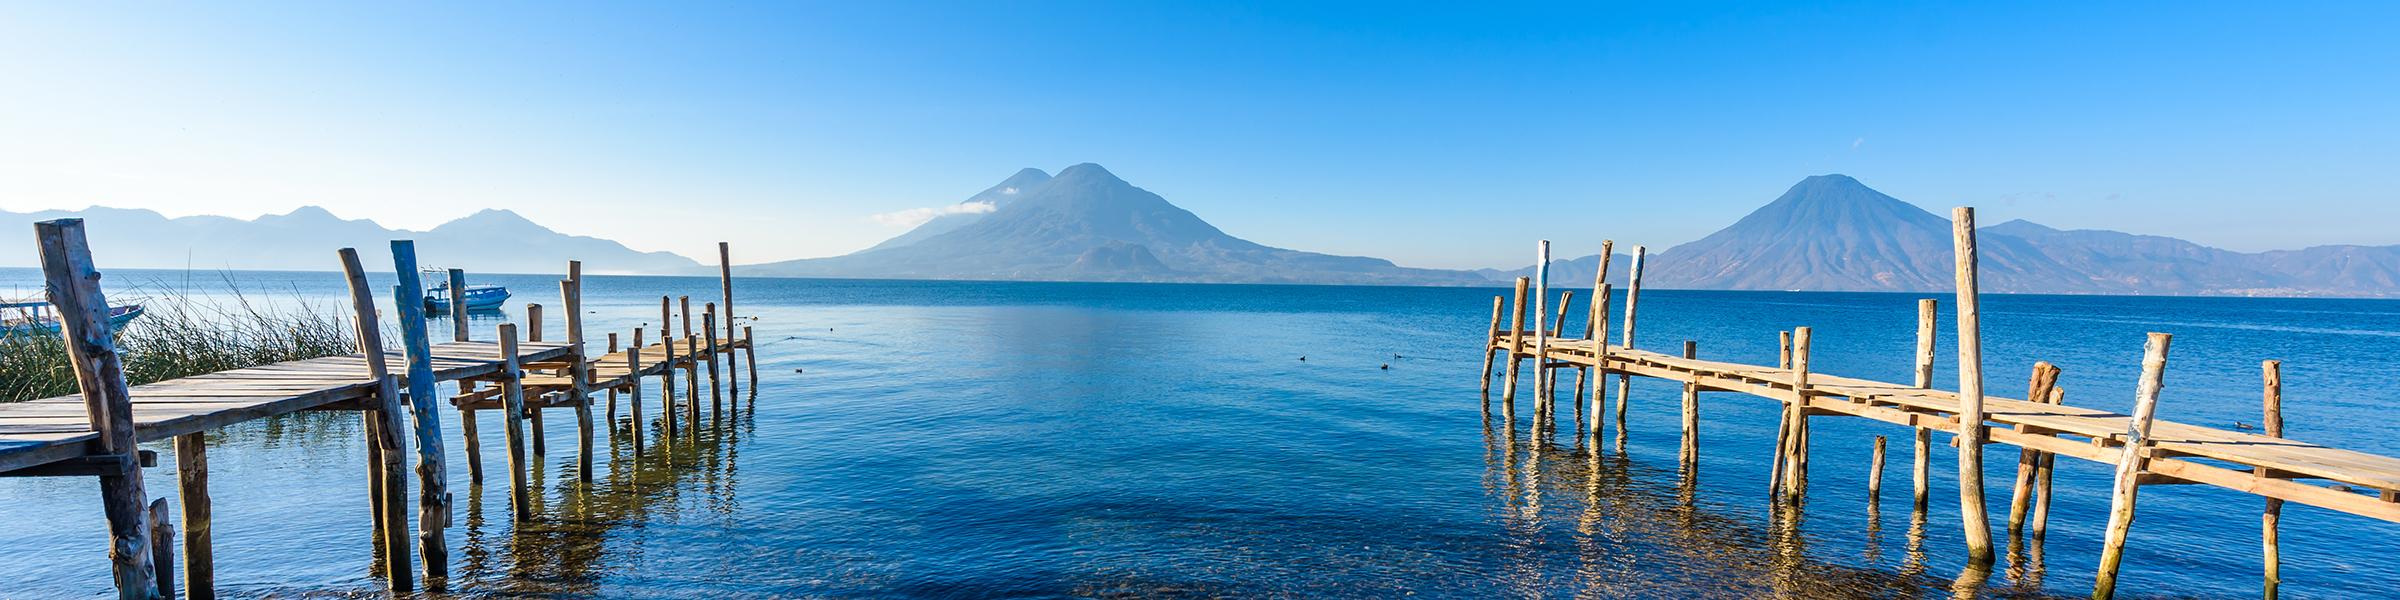 Guatemala Lake Atitlán